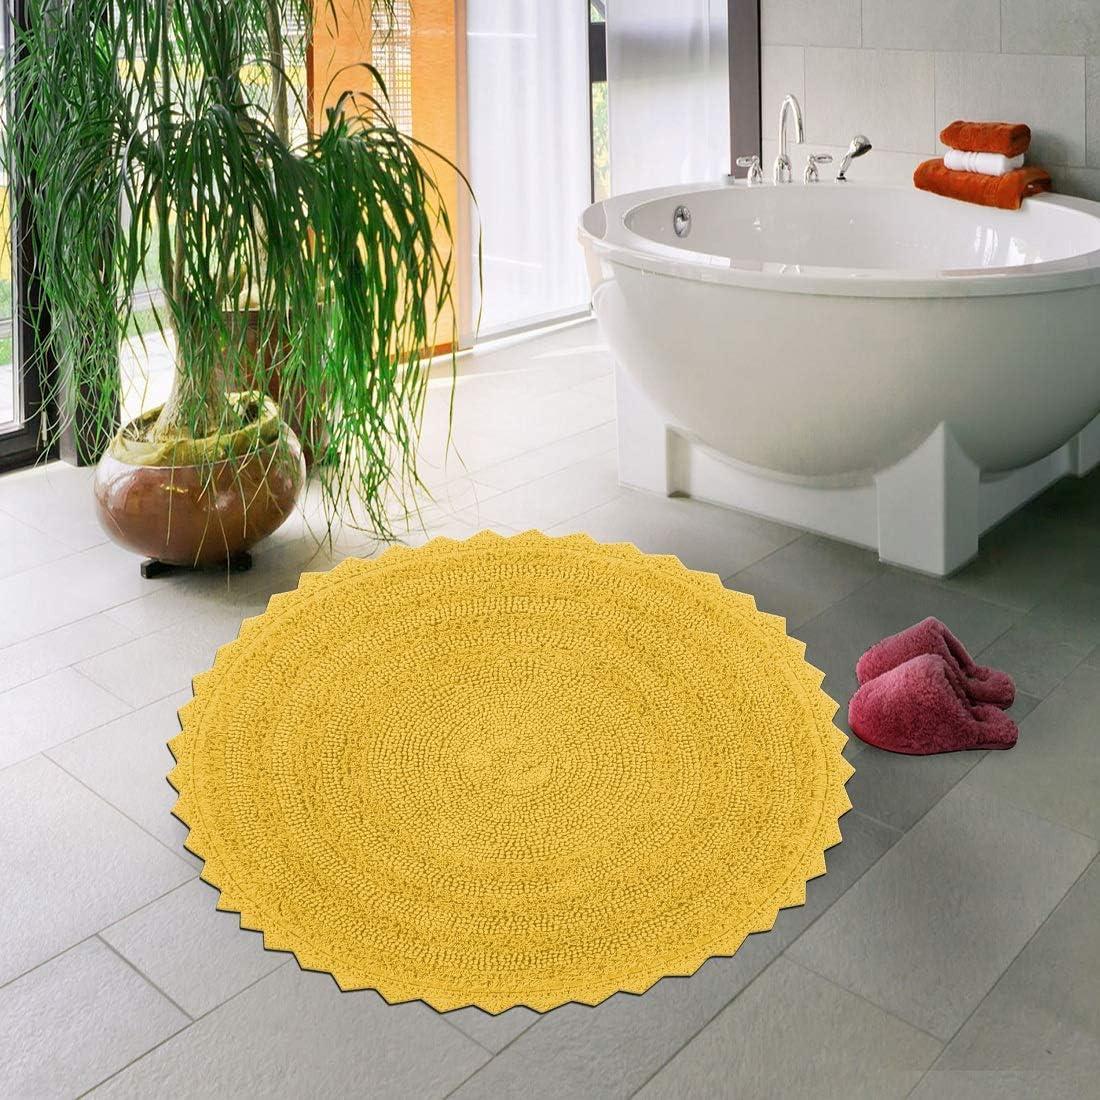 Crochet Reversible Bath Mat 2021 new 100% Popular brand Round Bathroom Cotton Rug